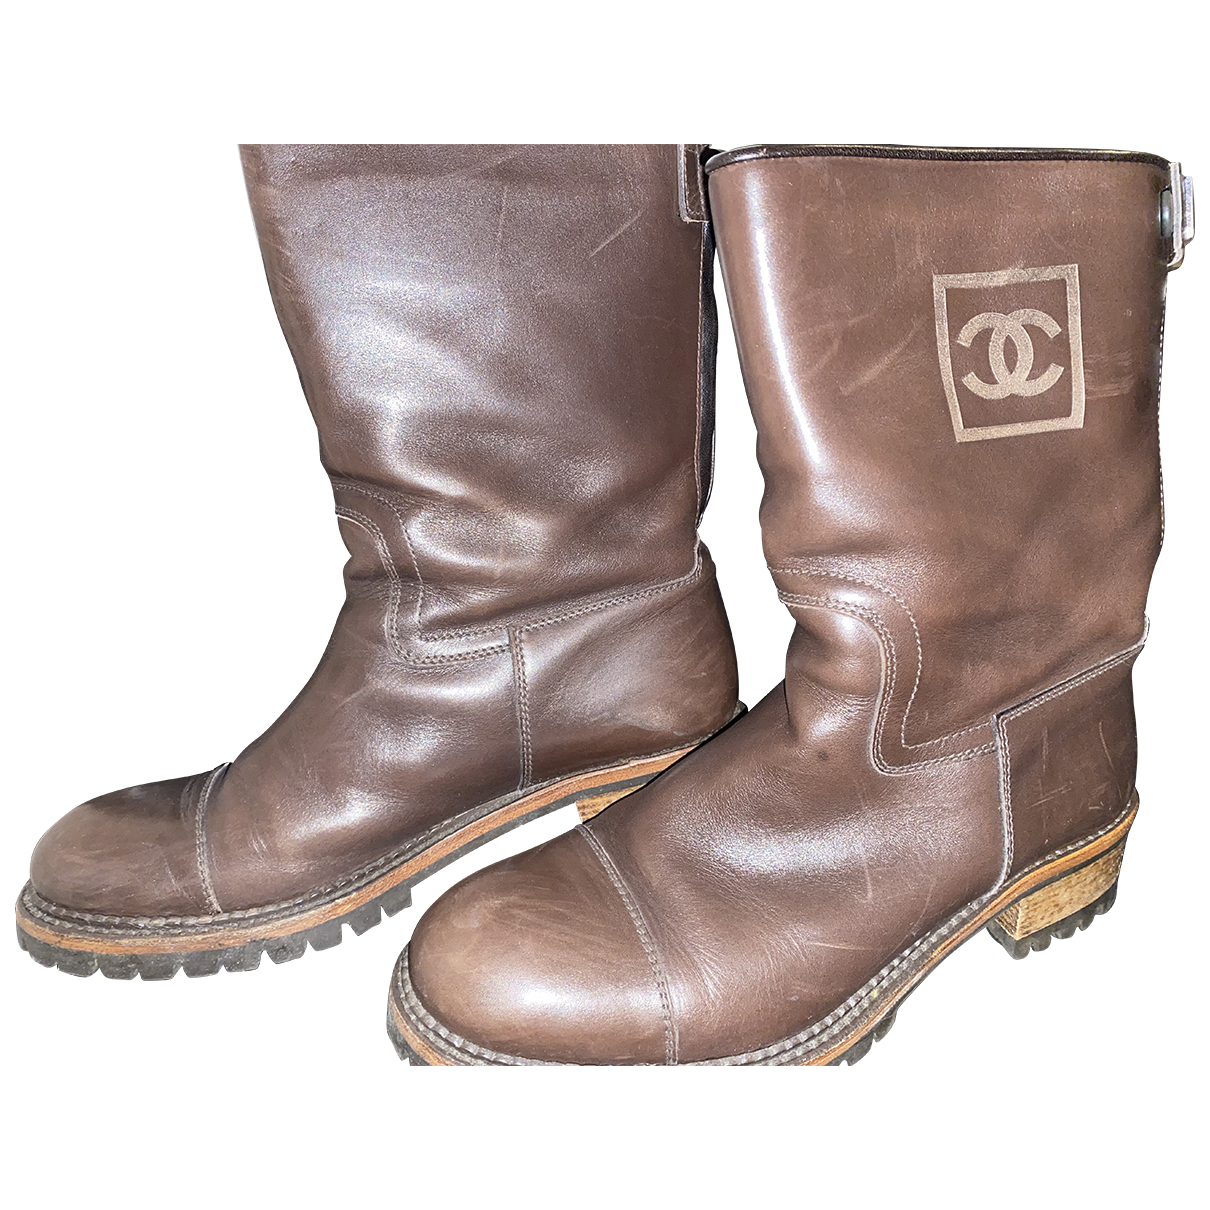 Chanel \N Stiefel in  Braun Leder